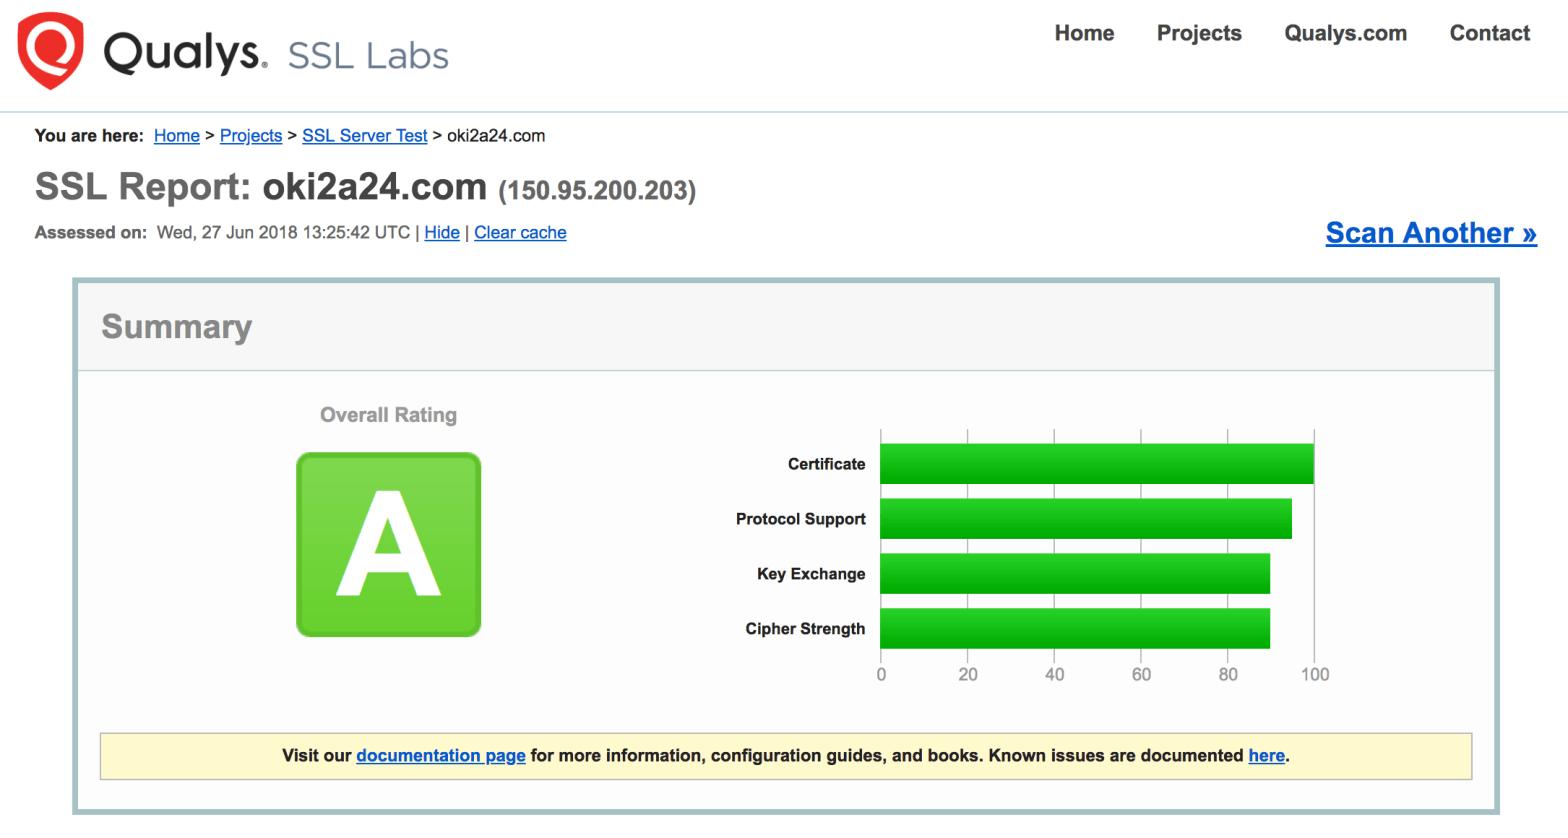 SSL Server Test の結果は A でした。